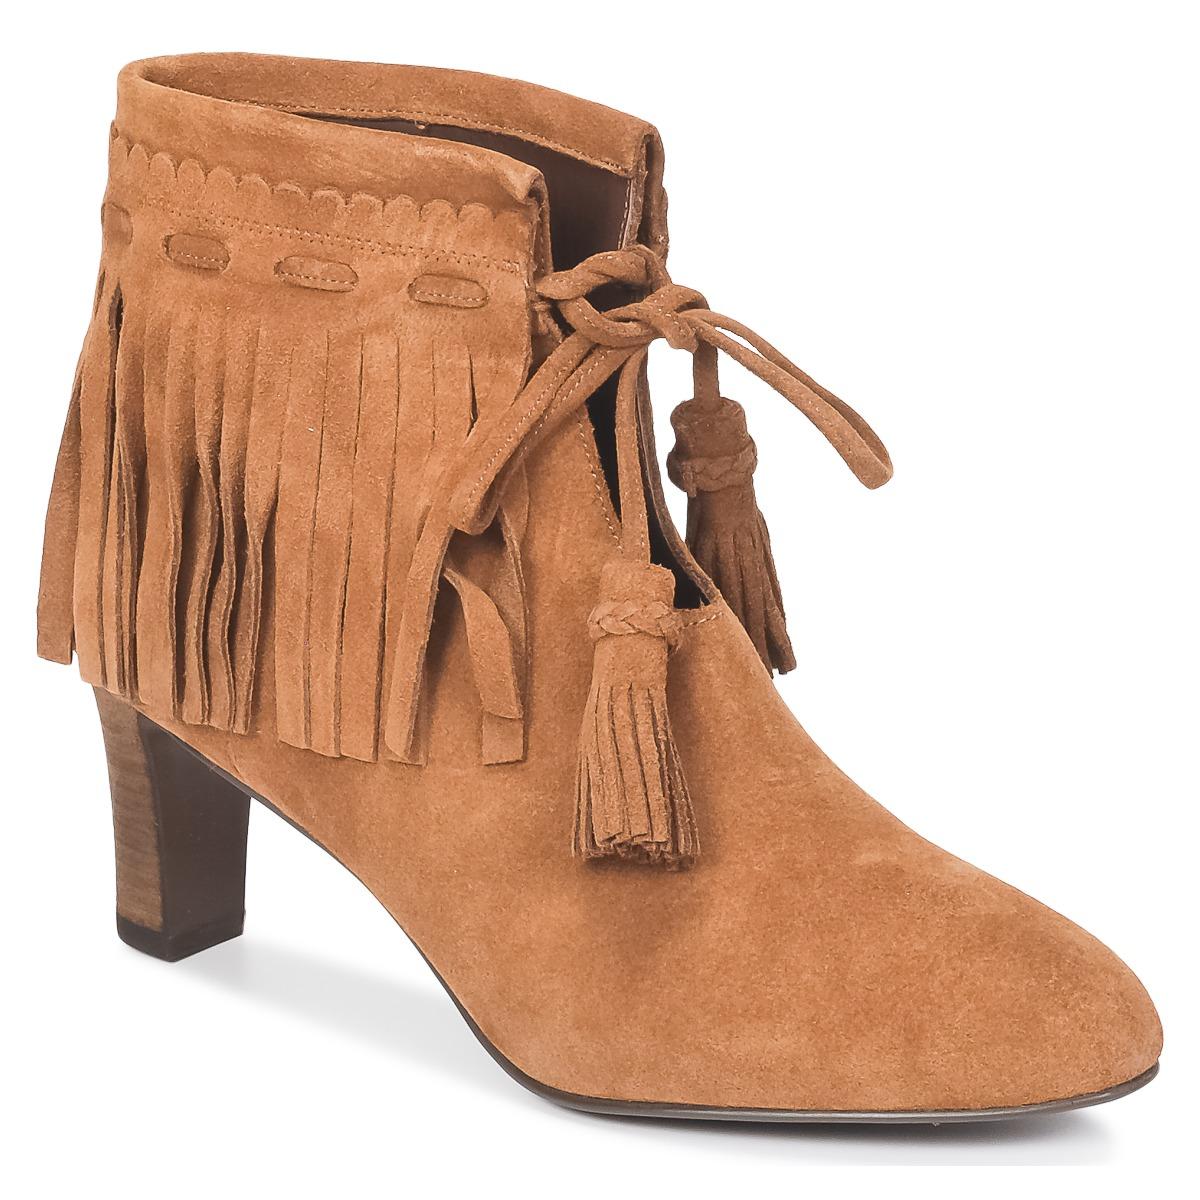 See by Chloé FLARIL Cognac - Kostenloser Versand bei Spartoode ! - Schuhe Low Boots Damen 241,50 €